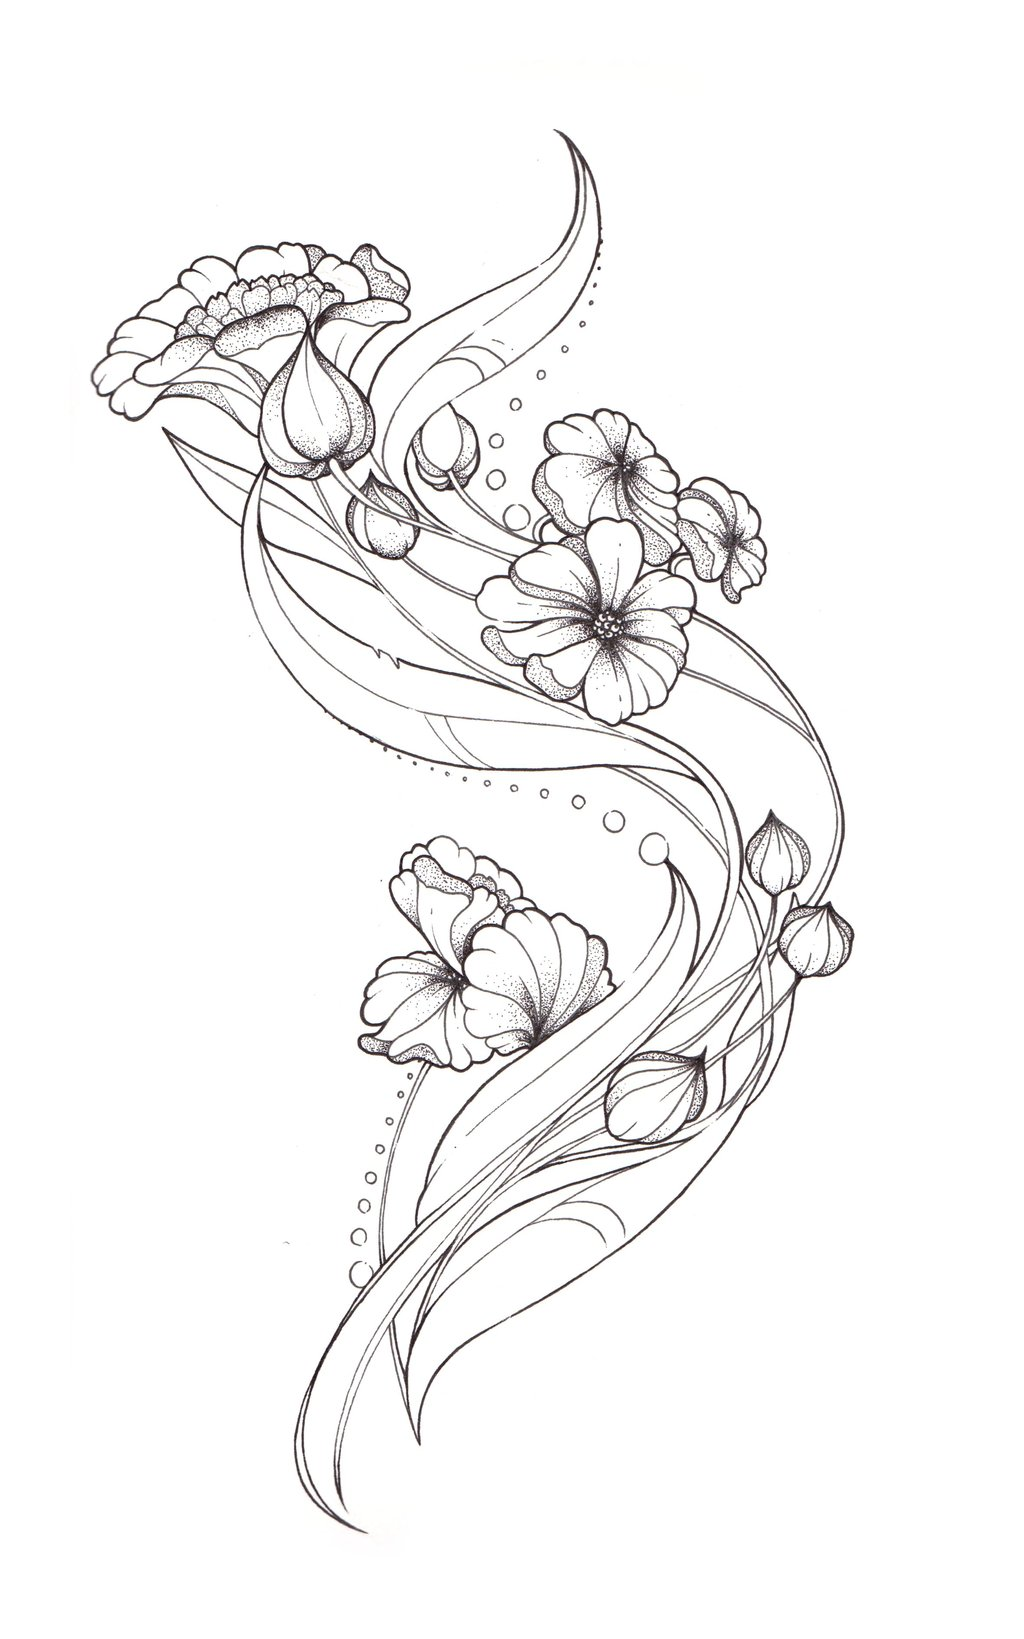 Drawn raven art deco Nouveau on ~Tegan Art Art